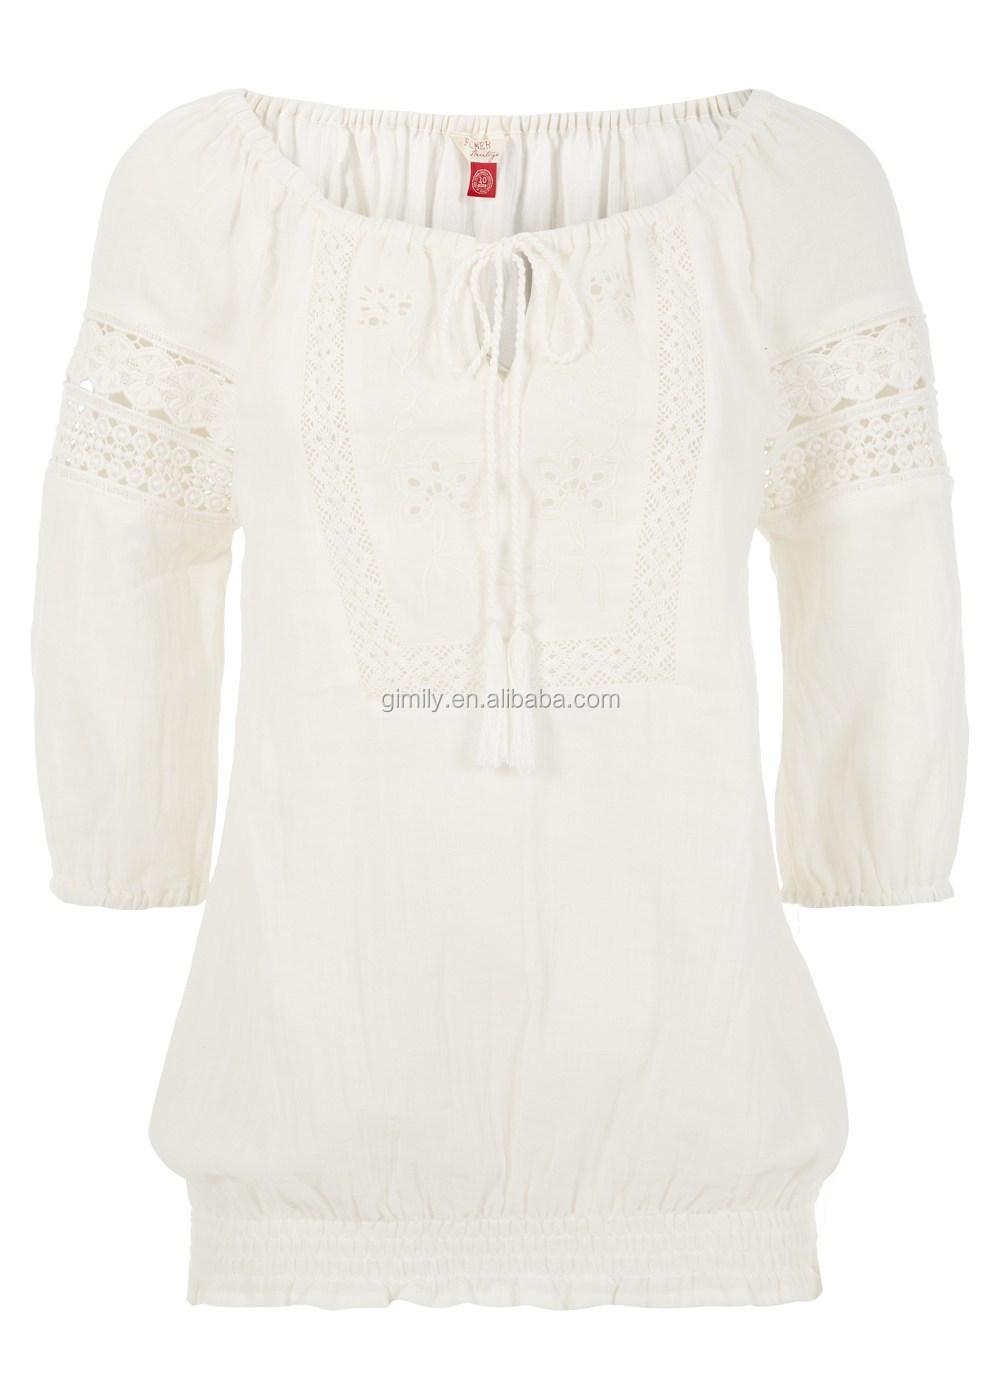 Lady Cotton Blouse Women Fashion Blouses Girls Fabric Tops 3/4 ...